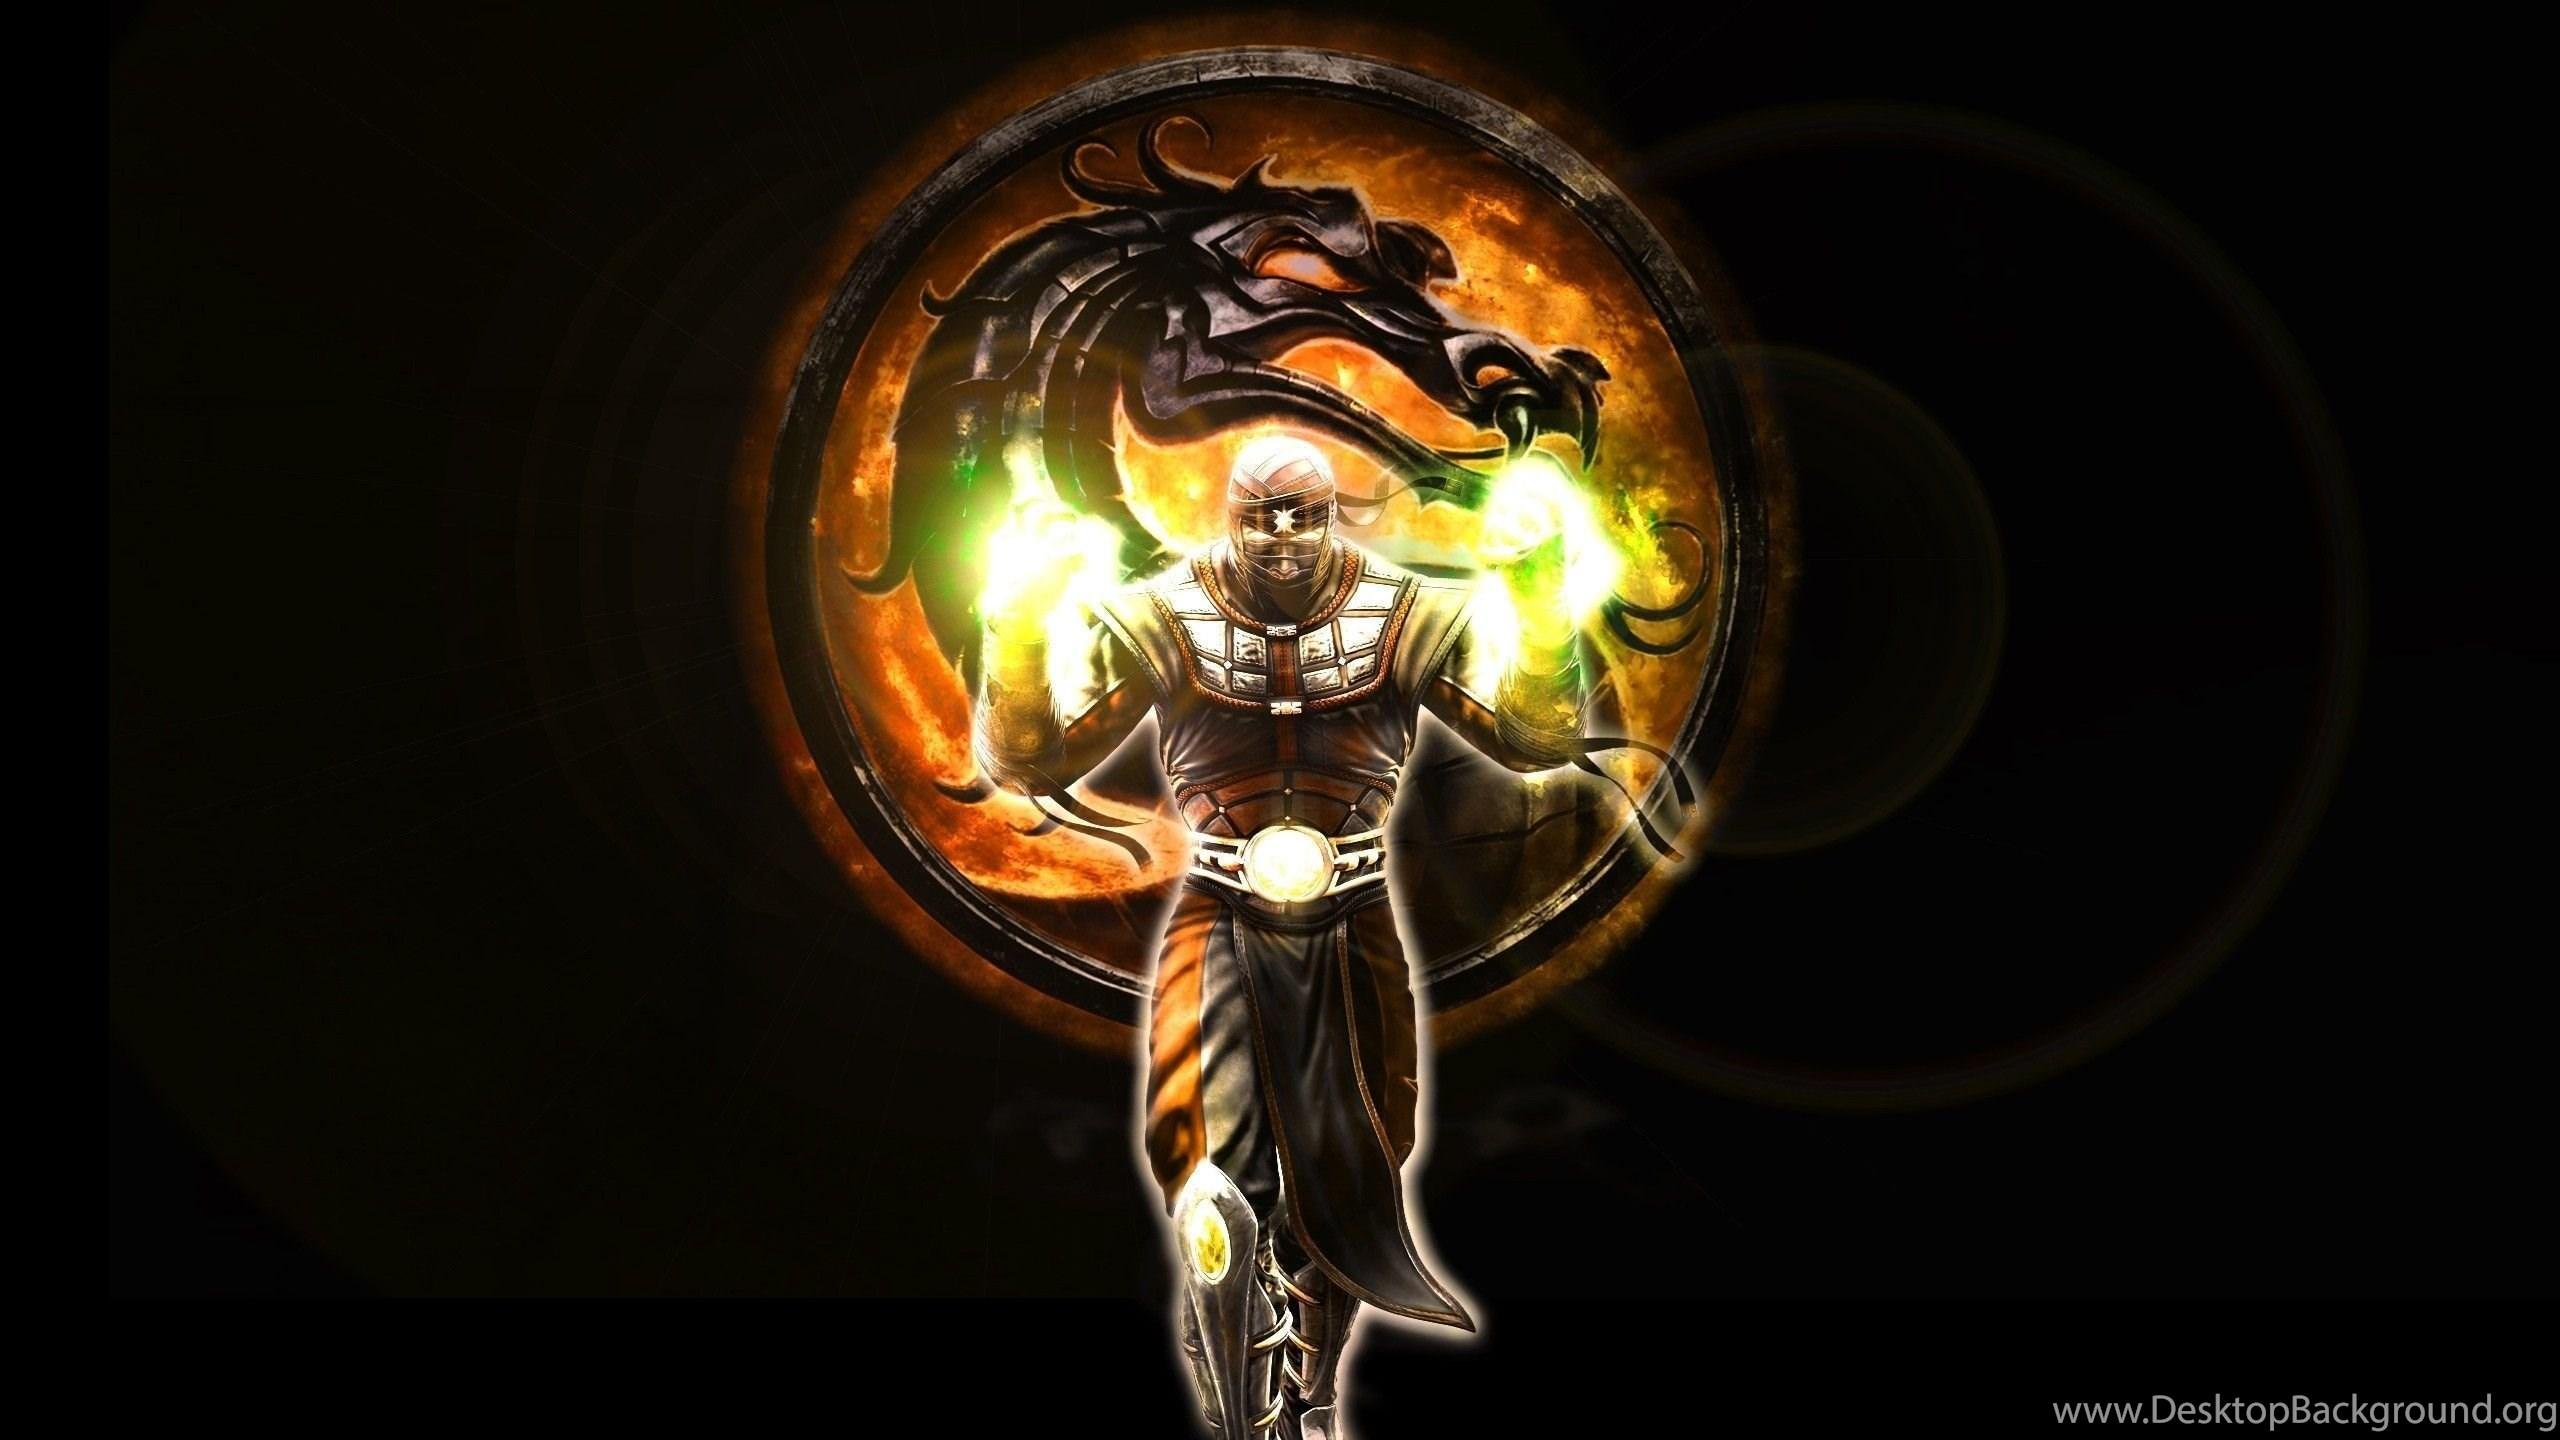 Free Download Full Hd Mortal Kombat Logo Wallpaper Hq Backgrounds